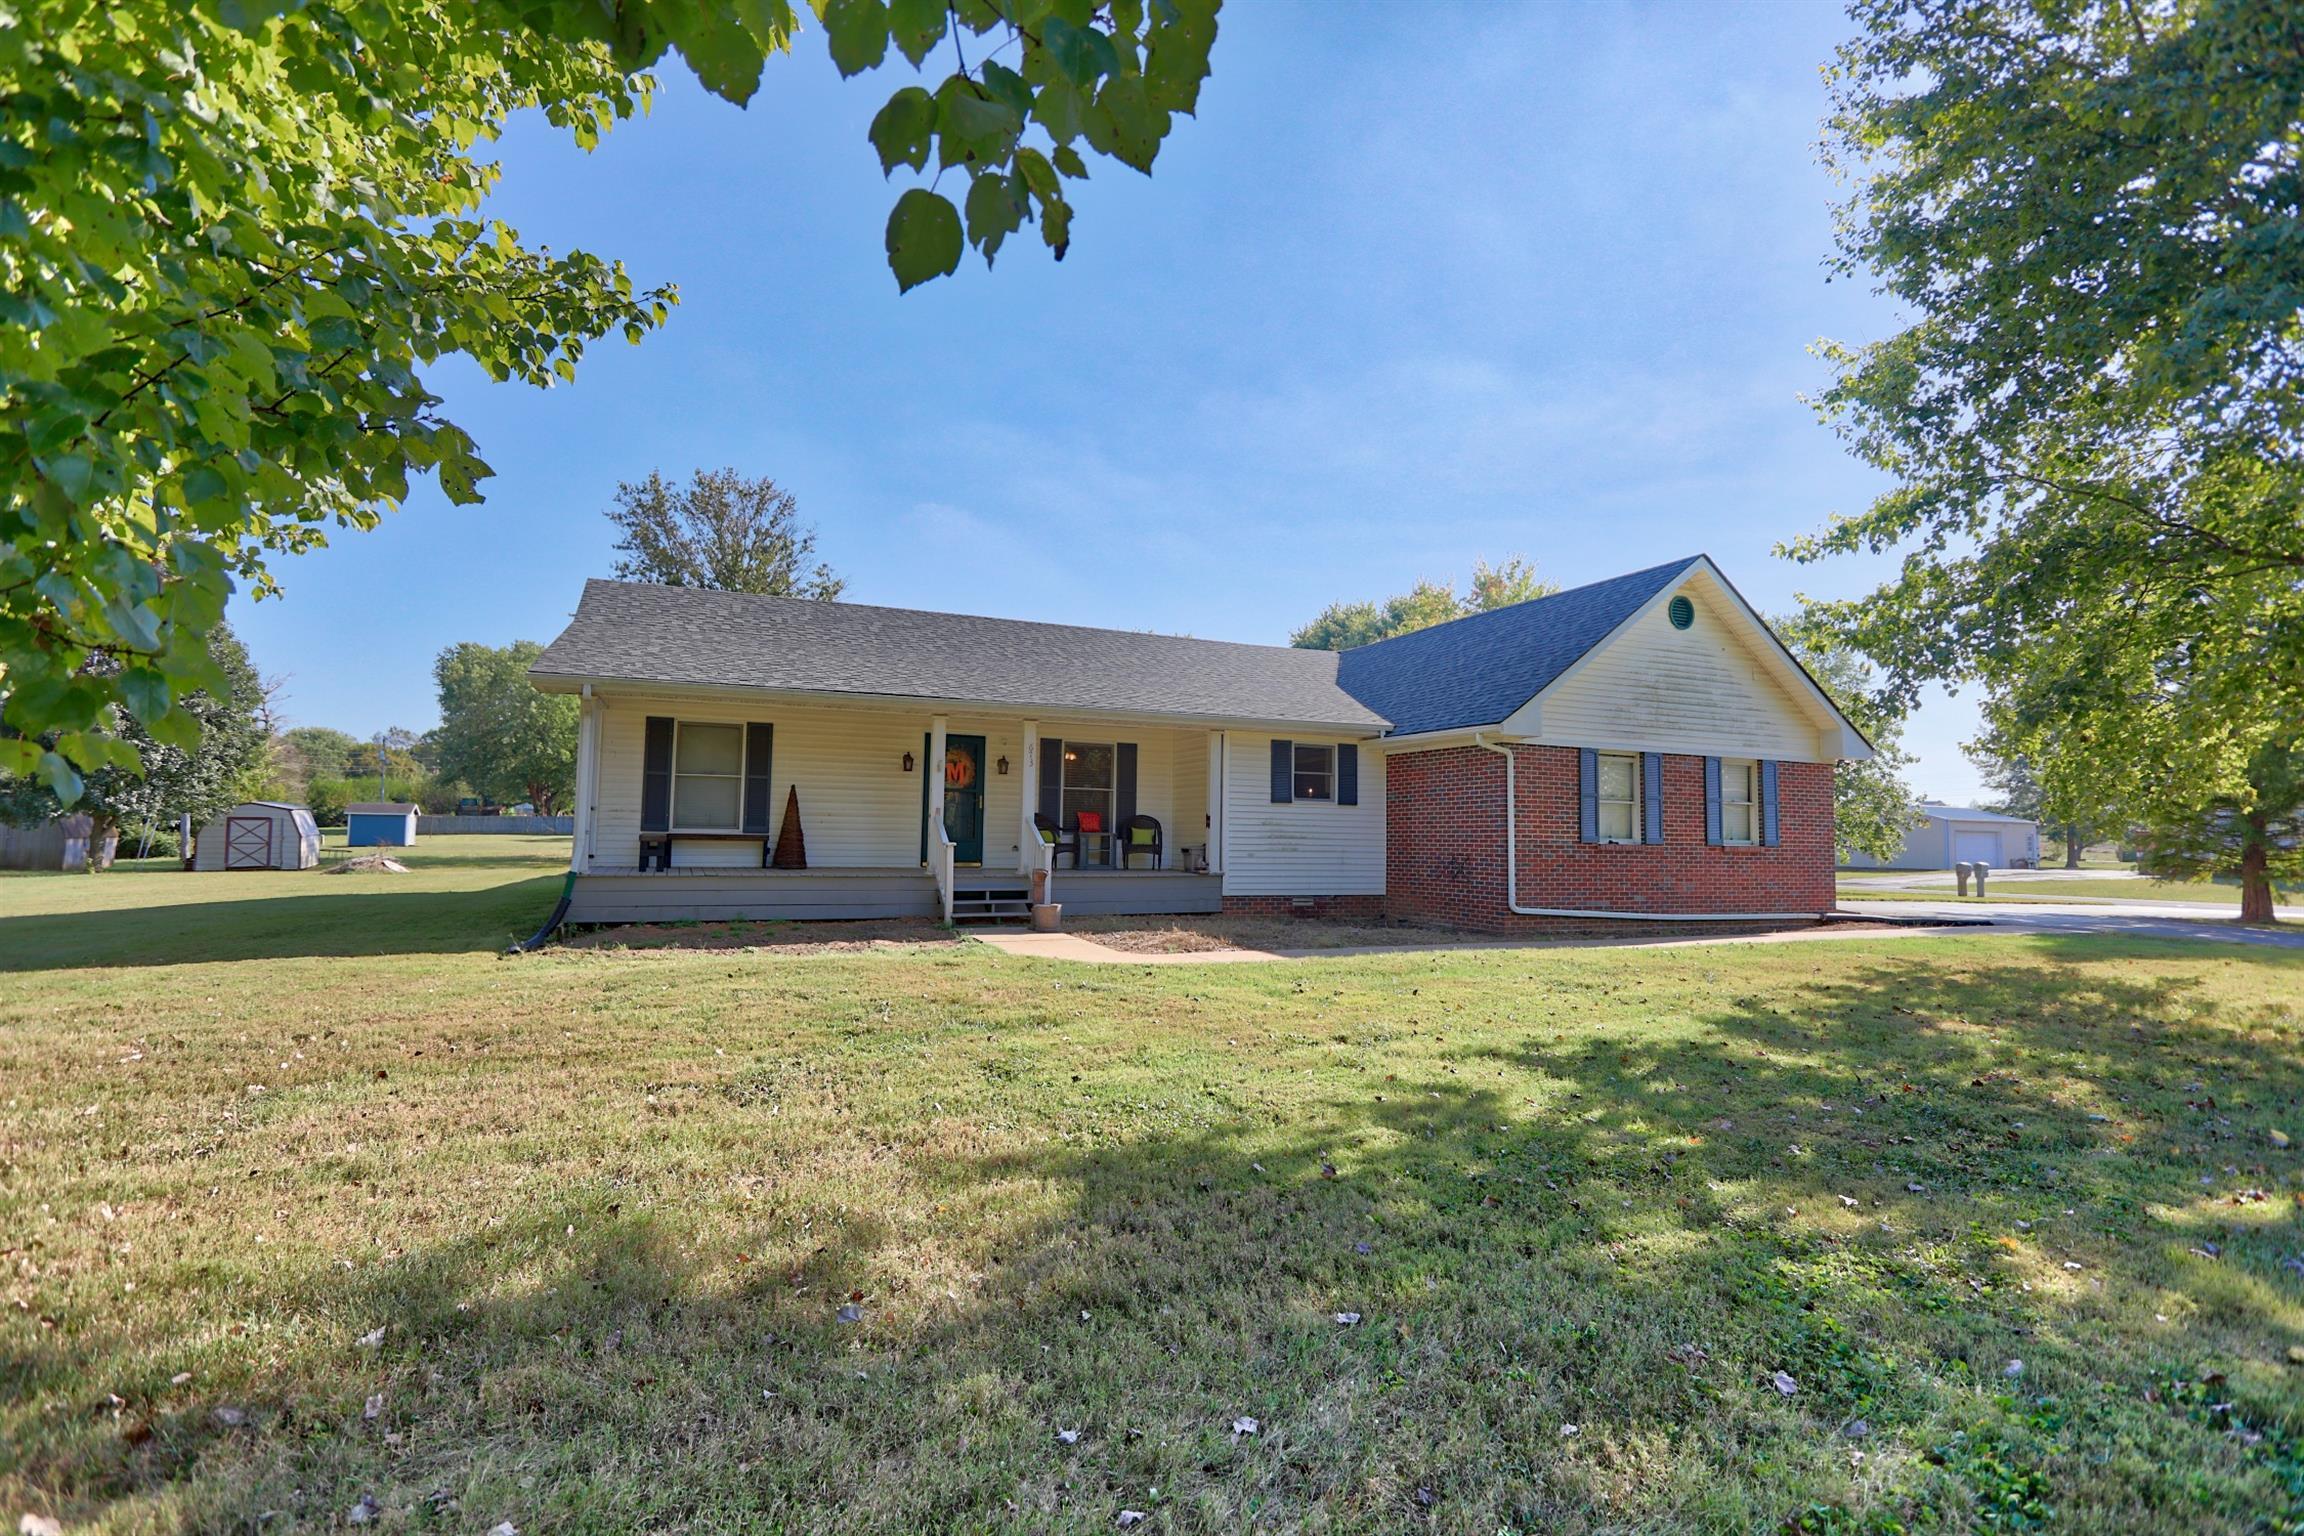 673 Patton Rd, Franklin, KY 42134 - Franklin, KY real estate listing